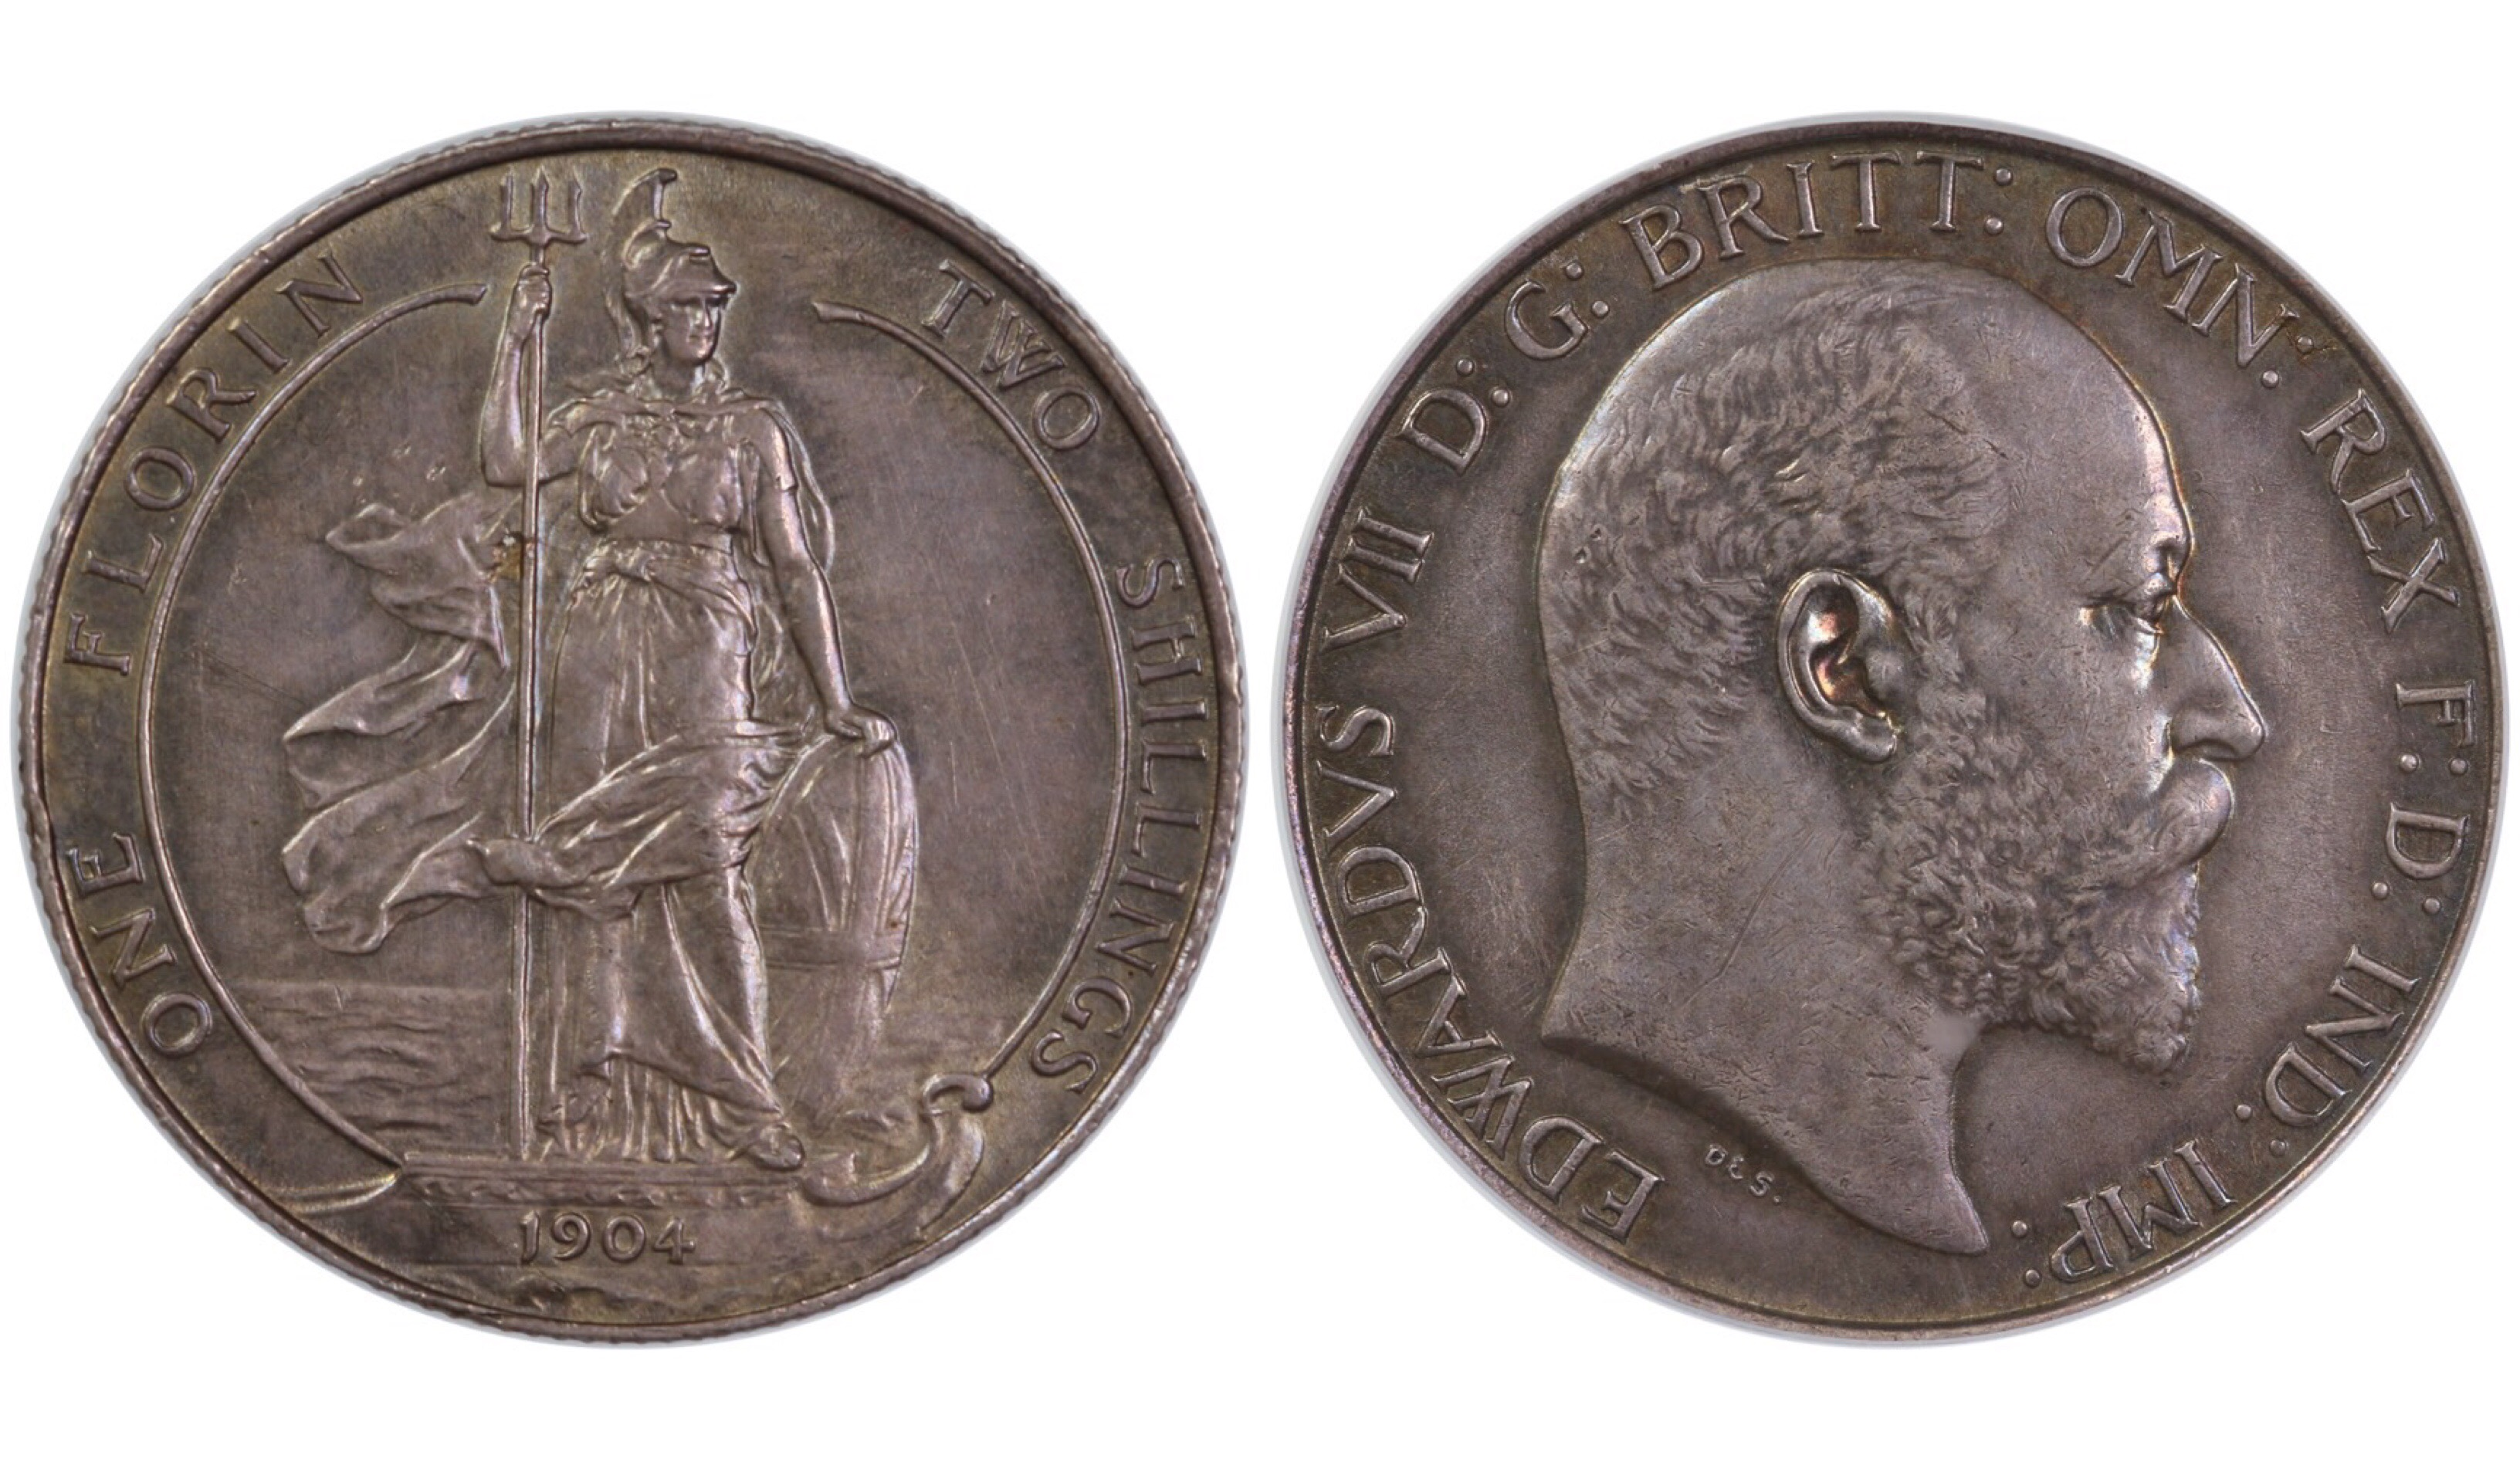 1904 Florin, gEF, CGS 65, Edwards VII, ESC 922, UIN 31985